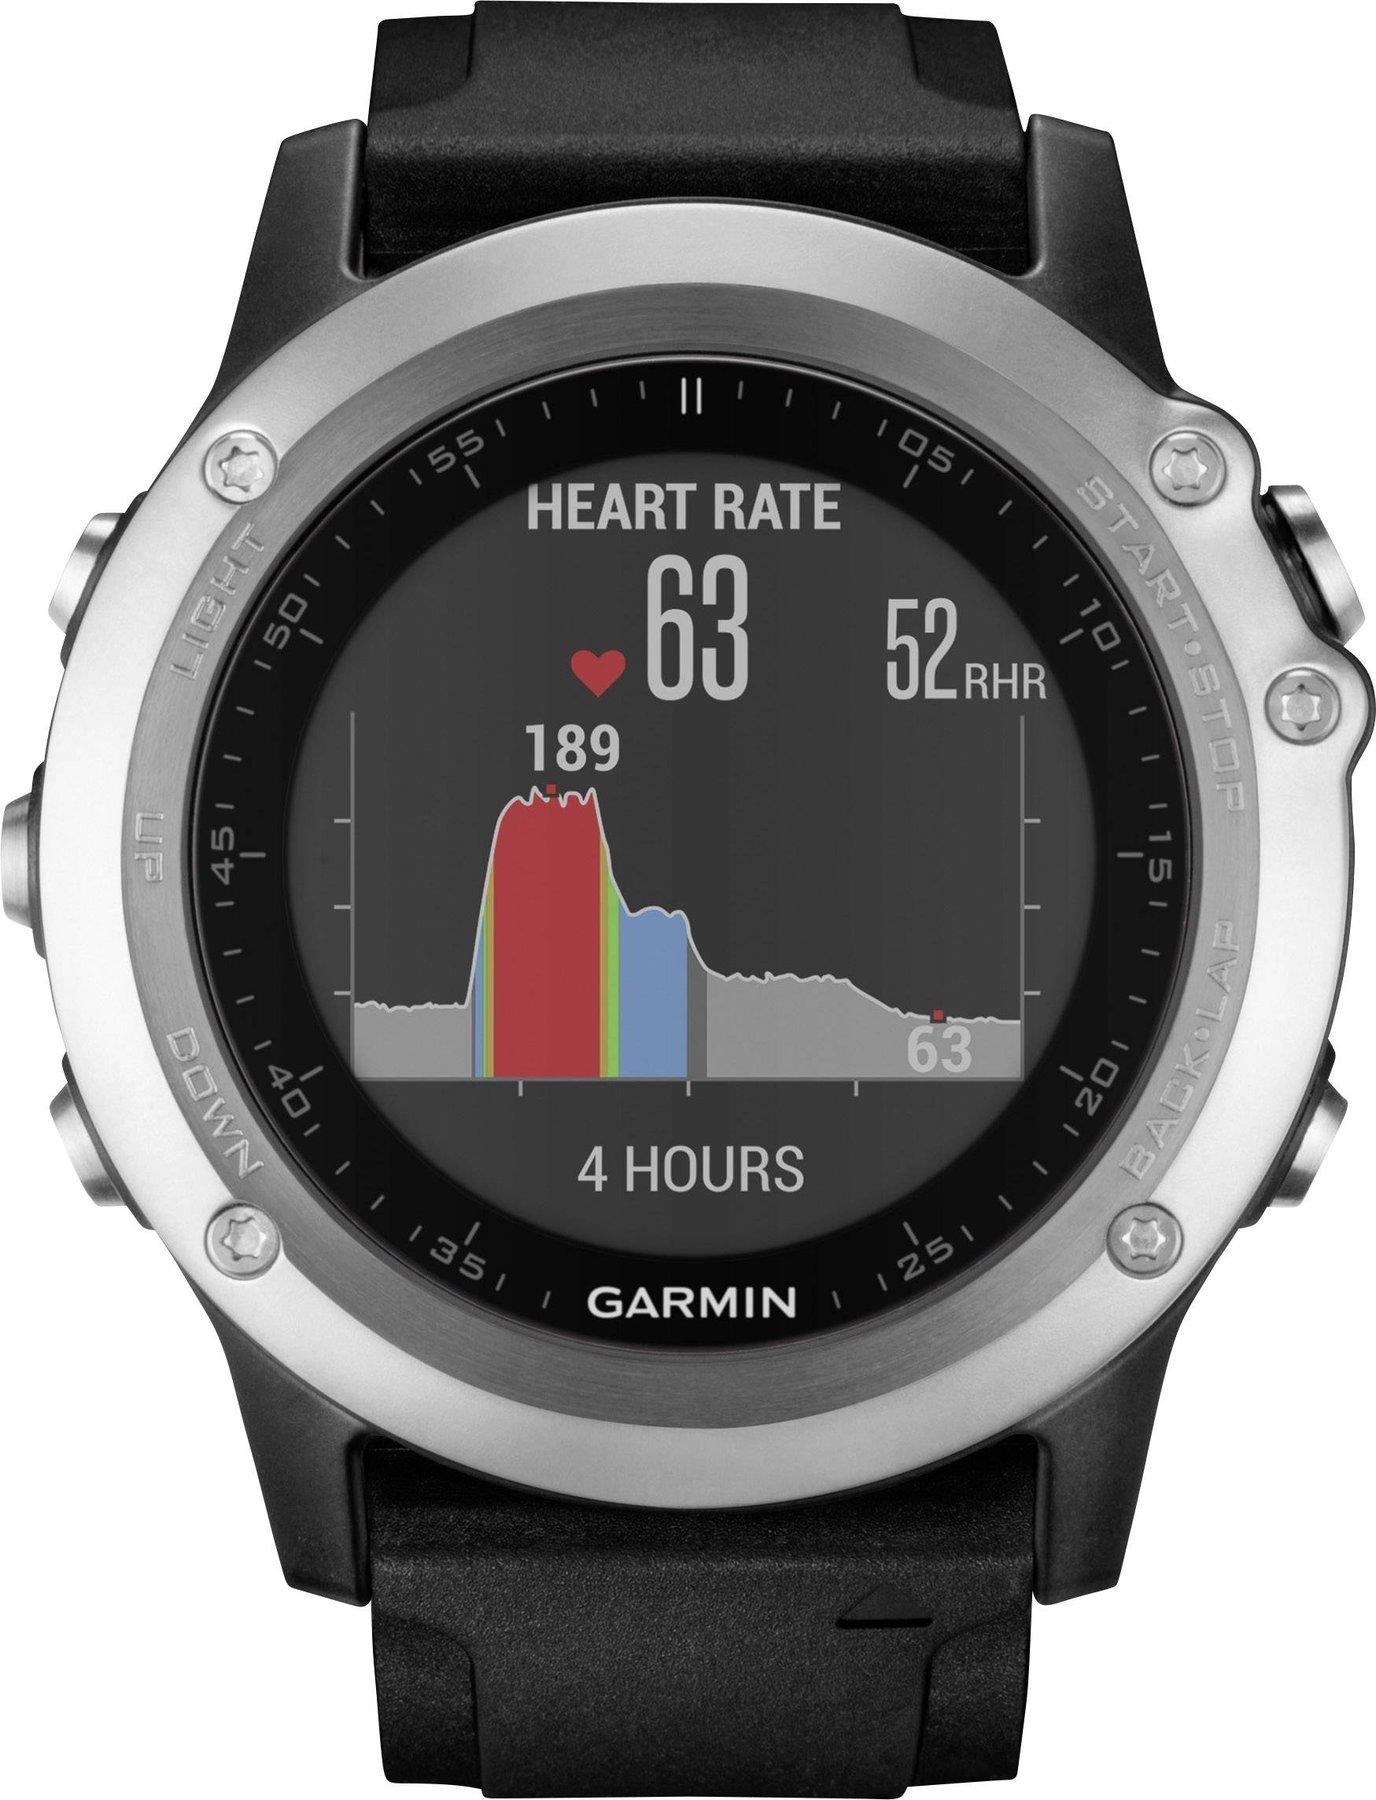 Grau günstig kaufen Fitness & Jogging Garmin Fenix 3 Multisportuhr